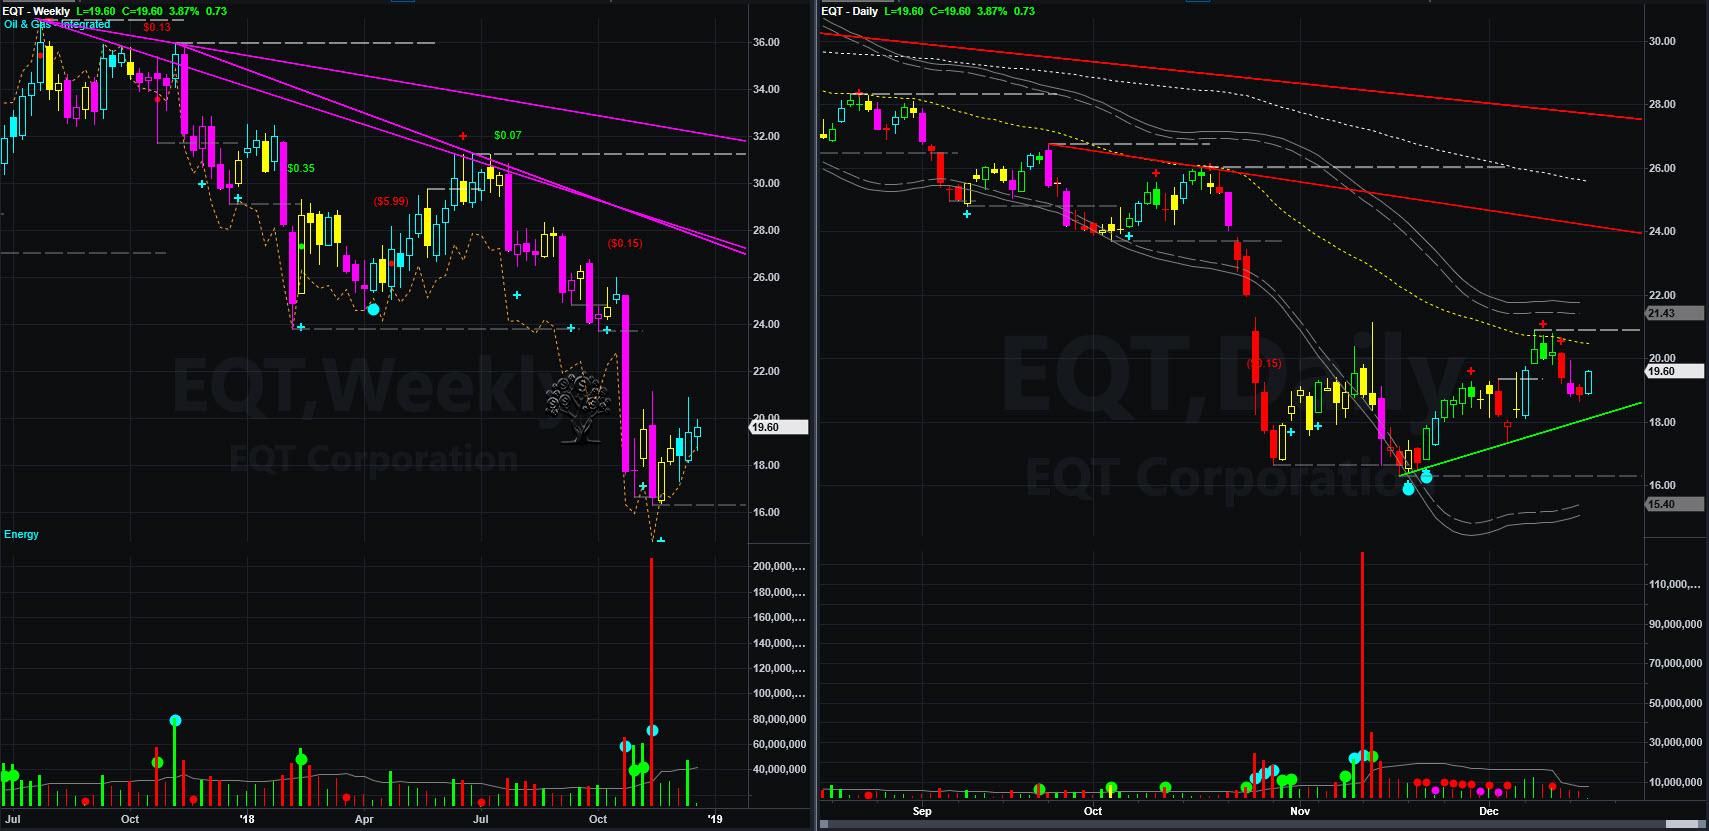 EQT chart 2018-12-19_11-05-16.jpg